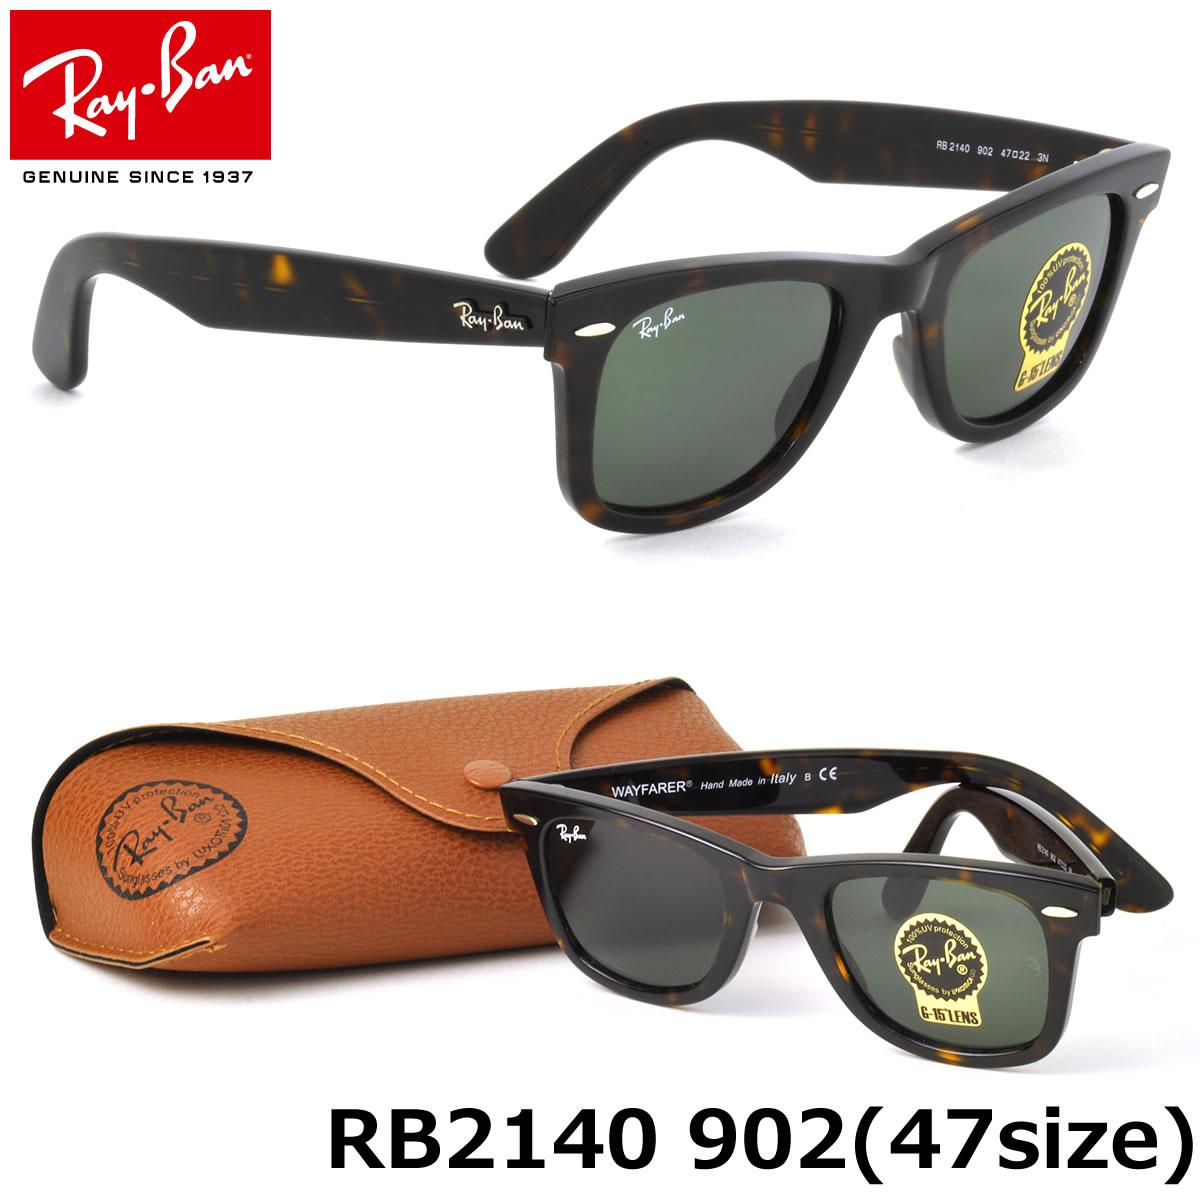 68428ff93d Ray-Ban Sunglasses RB2140 902 47size ORIGINAL WAYFARER GENUINE NEW rayban  ray ban